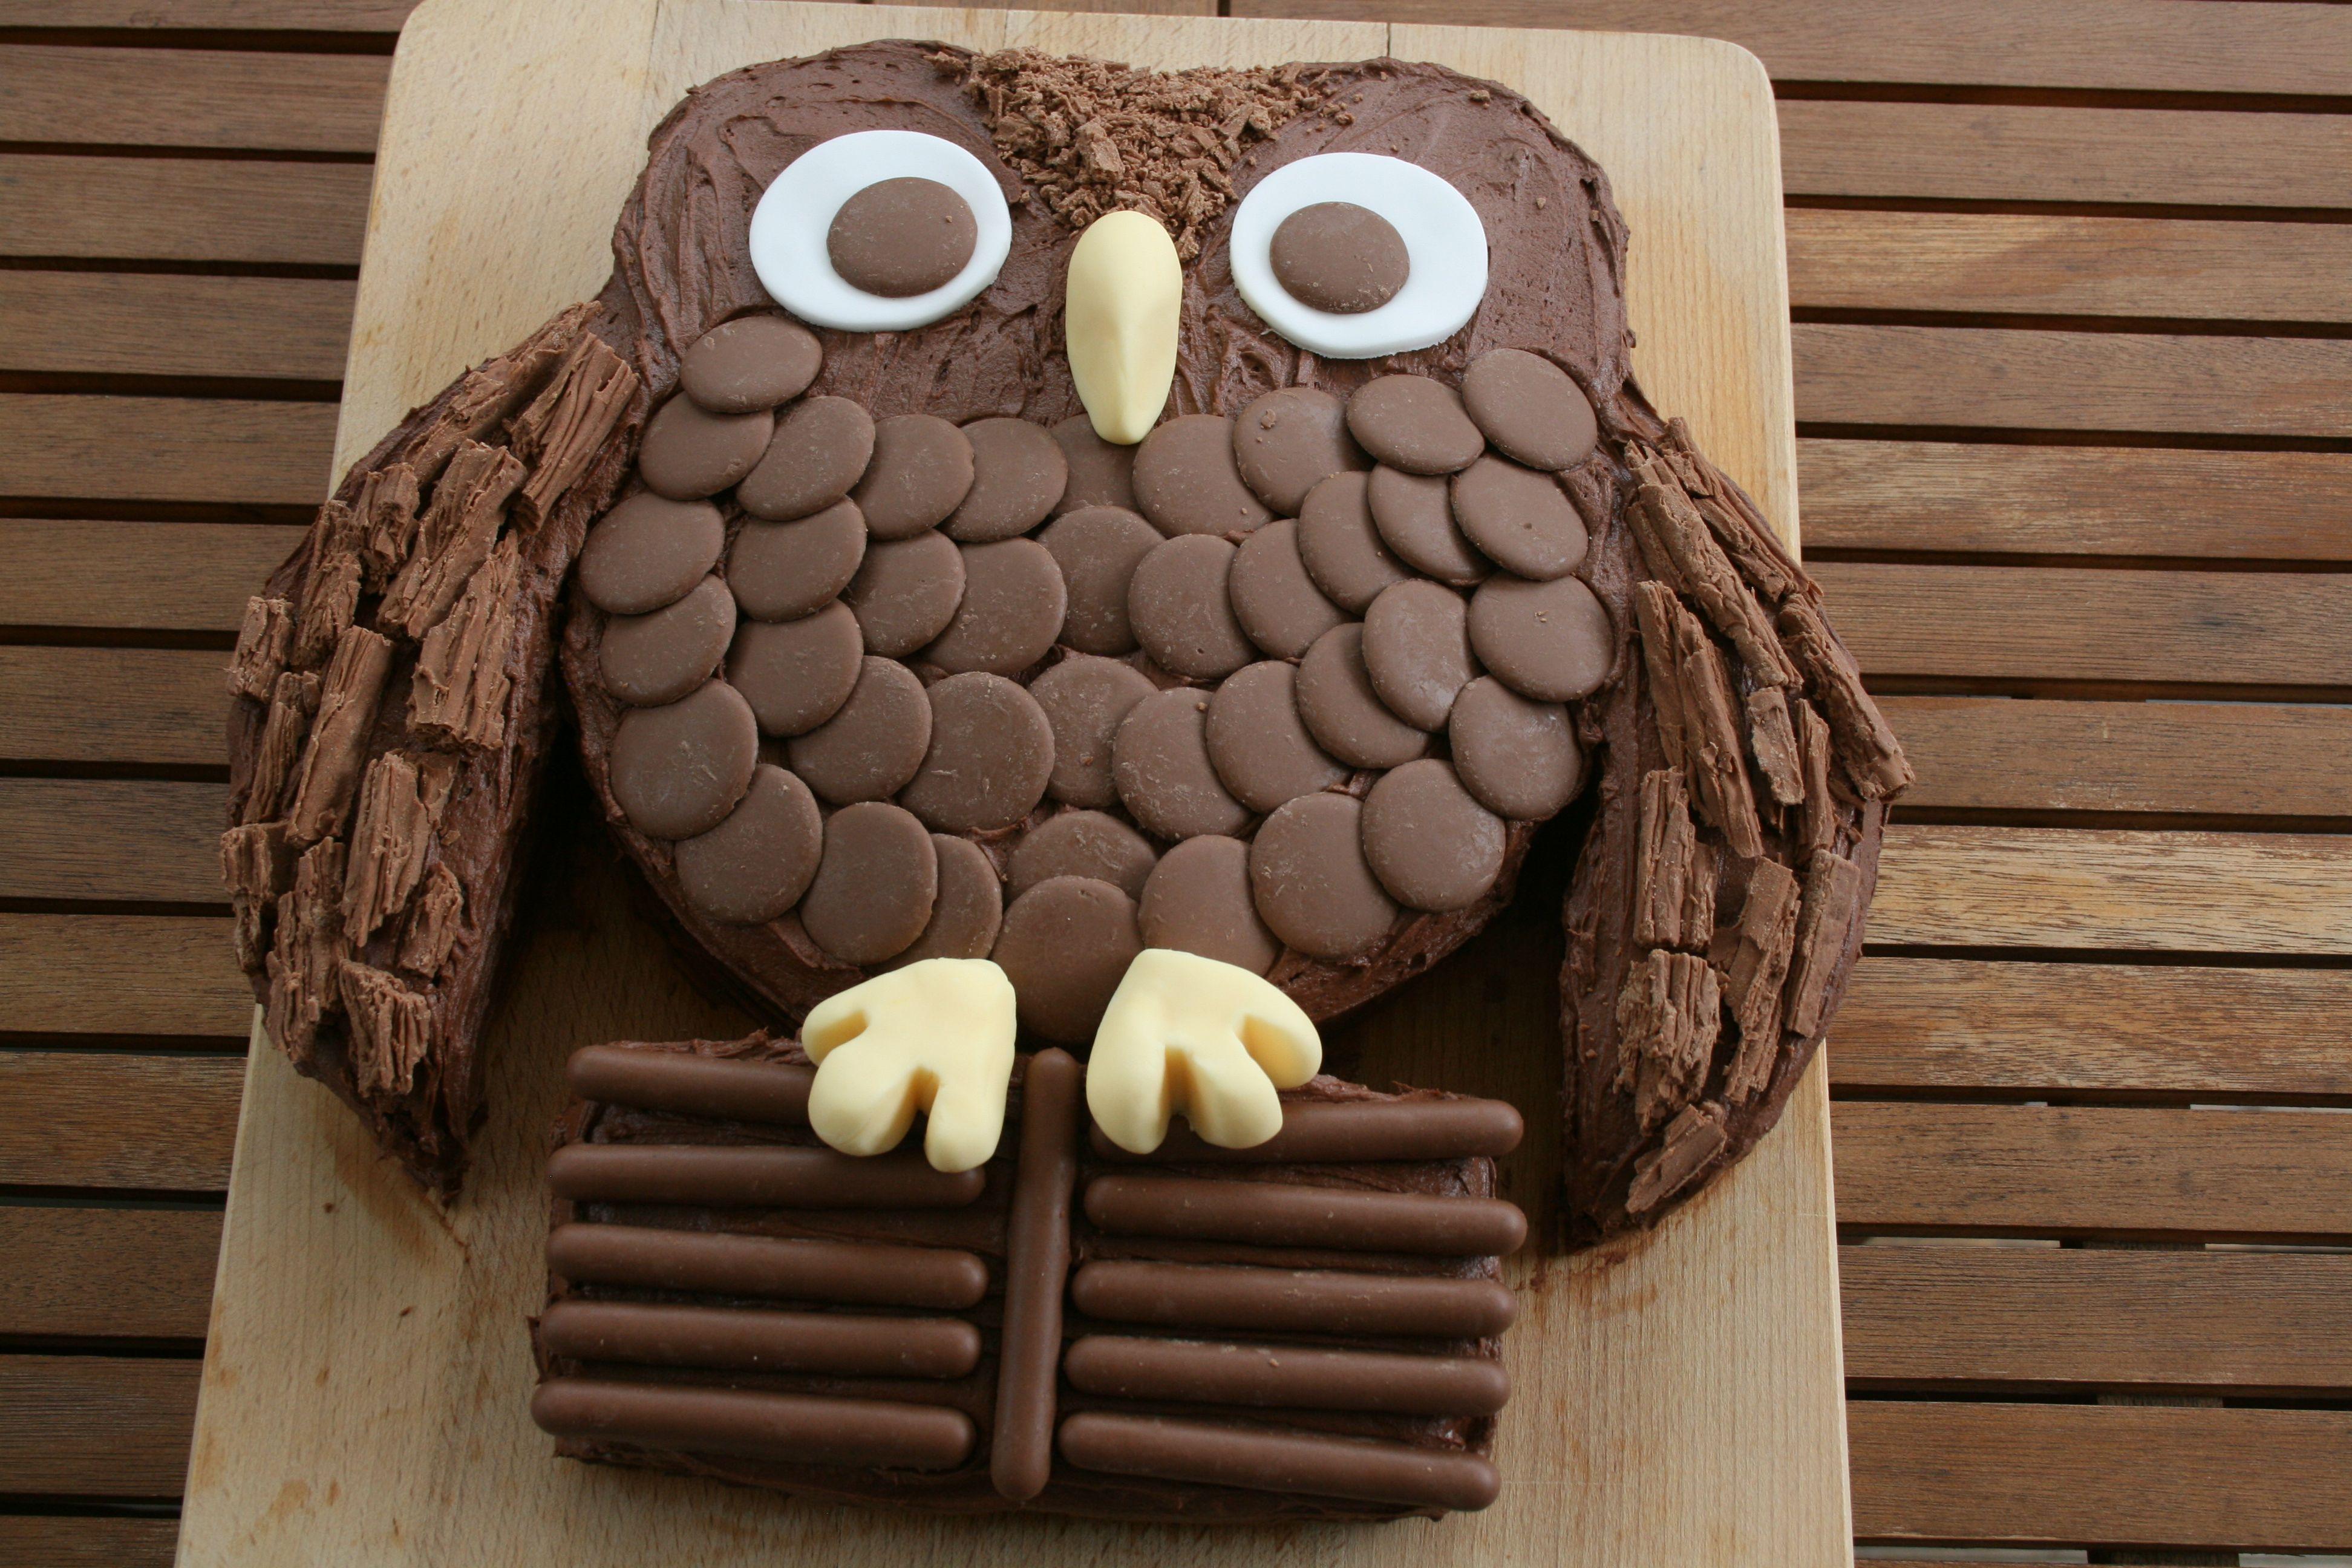 Chocolate Owl Cake Chocolate cake with chocolate buttercream